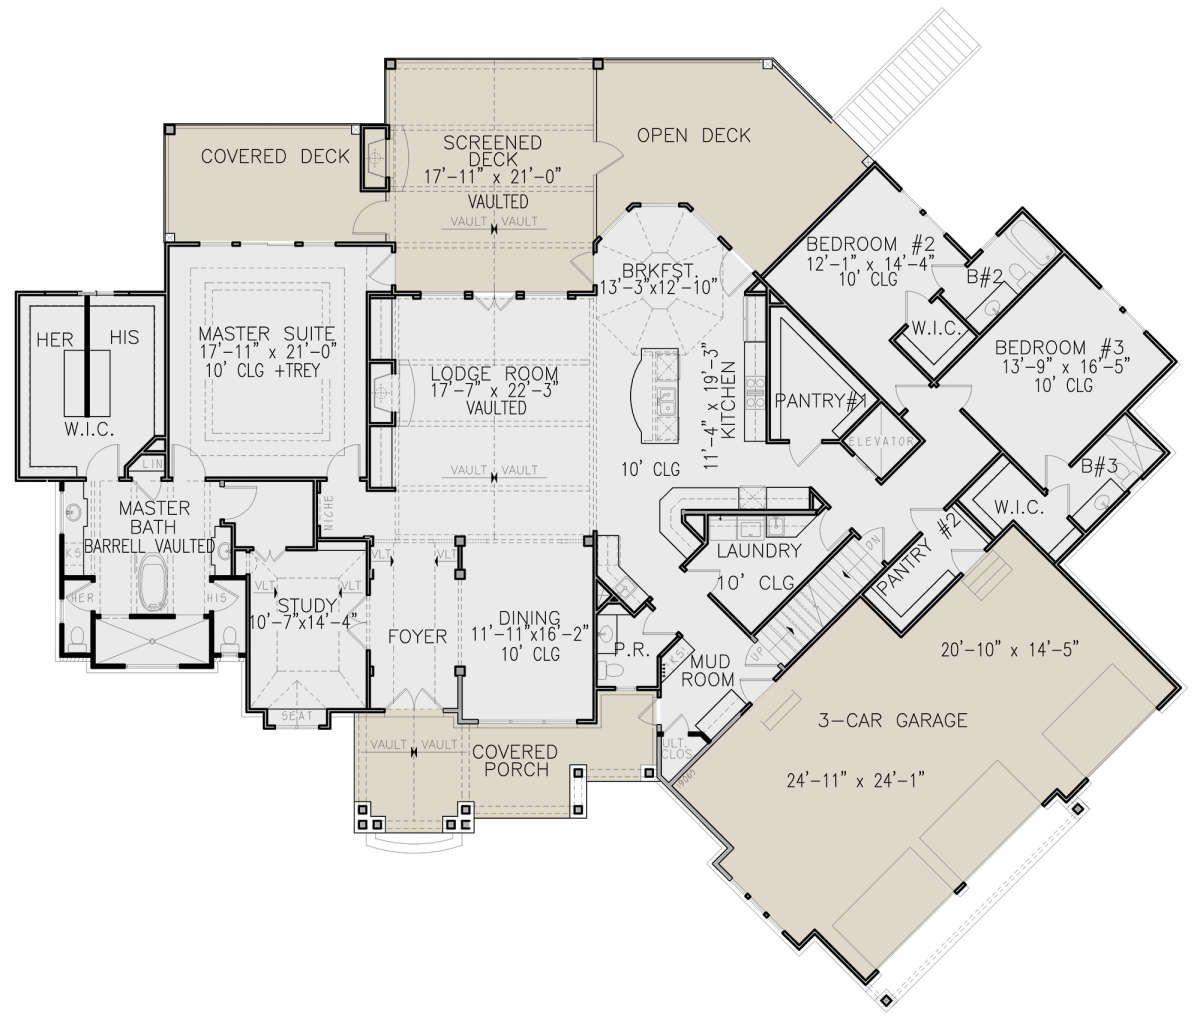 House Plan 699 00256 Craftsman Plan 3 730 Square Feet 3 Bedrooms 3 5 Bathrooms In 2020 Dream House Plans Craftsman House Plans House Plans Farmhouse